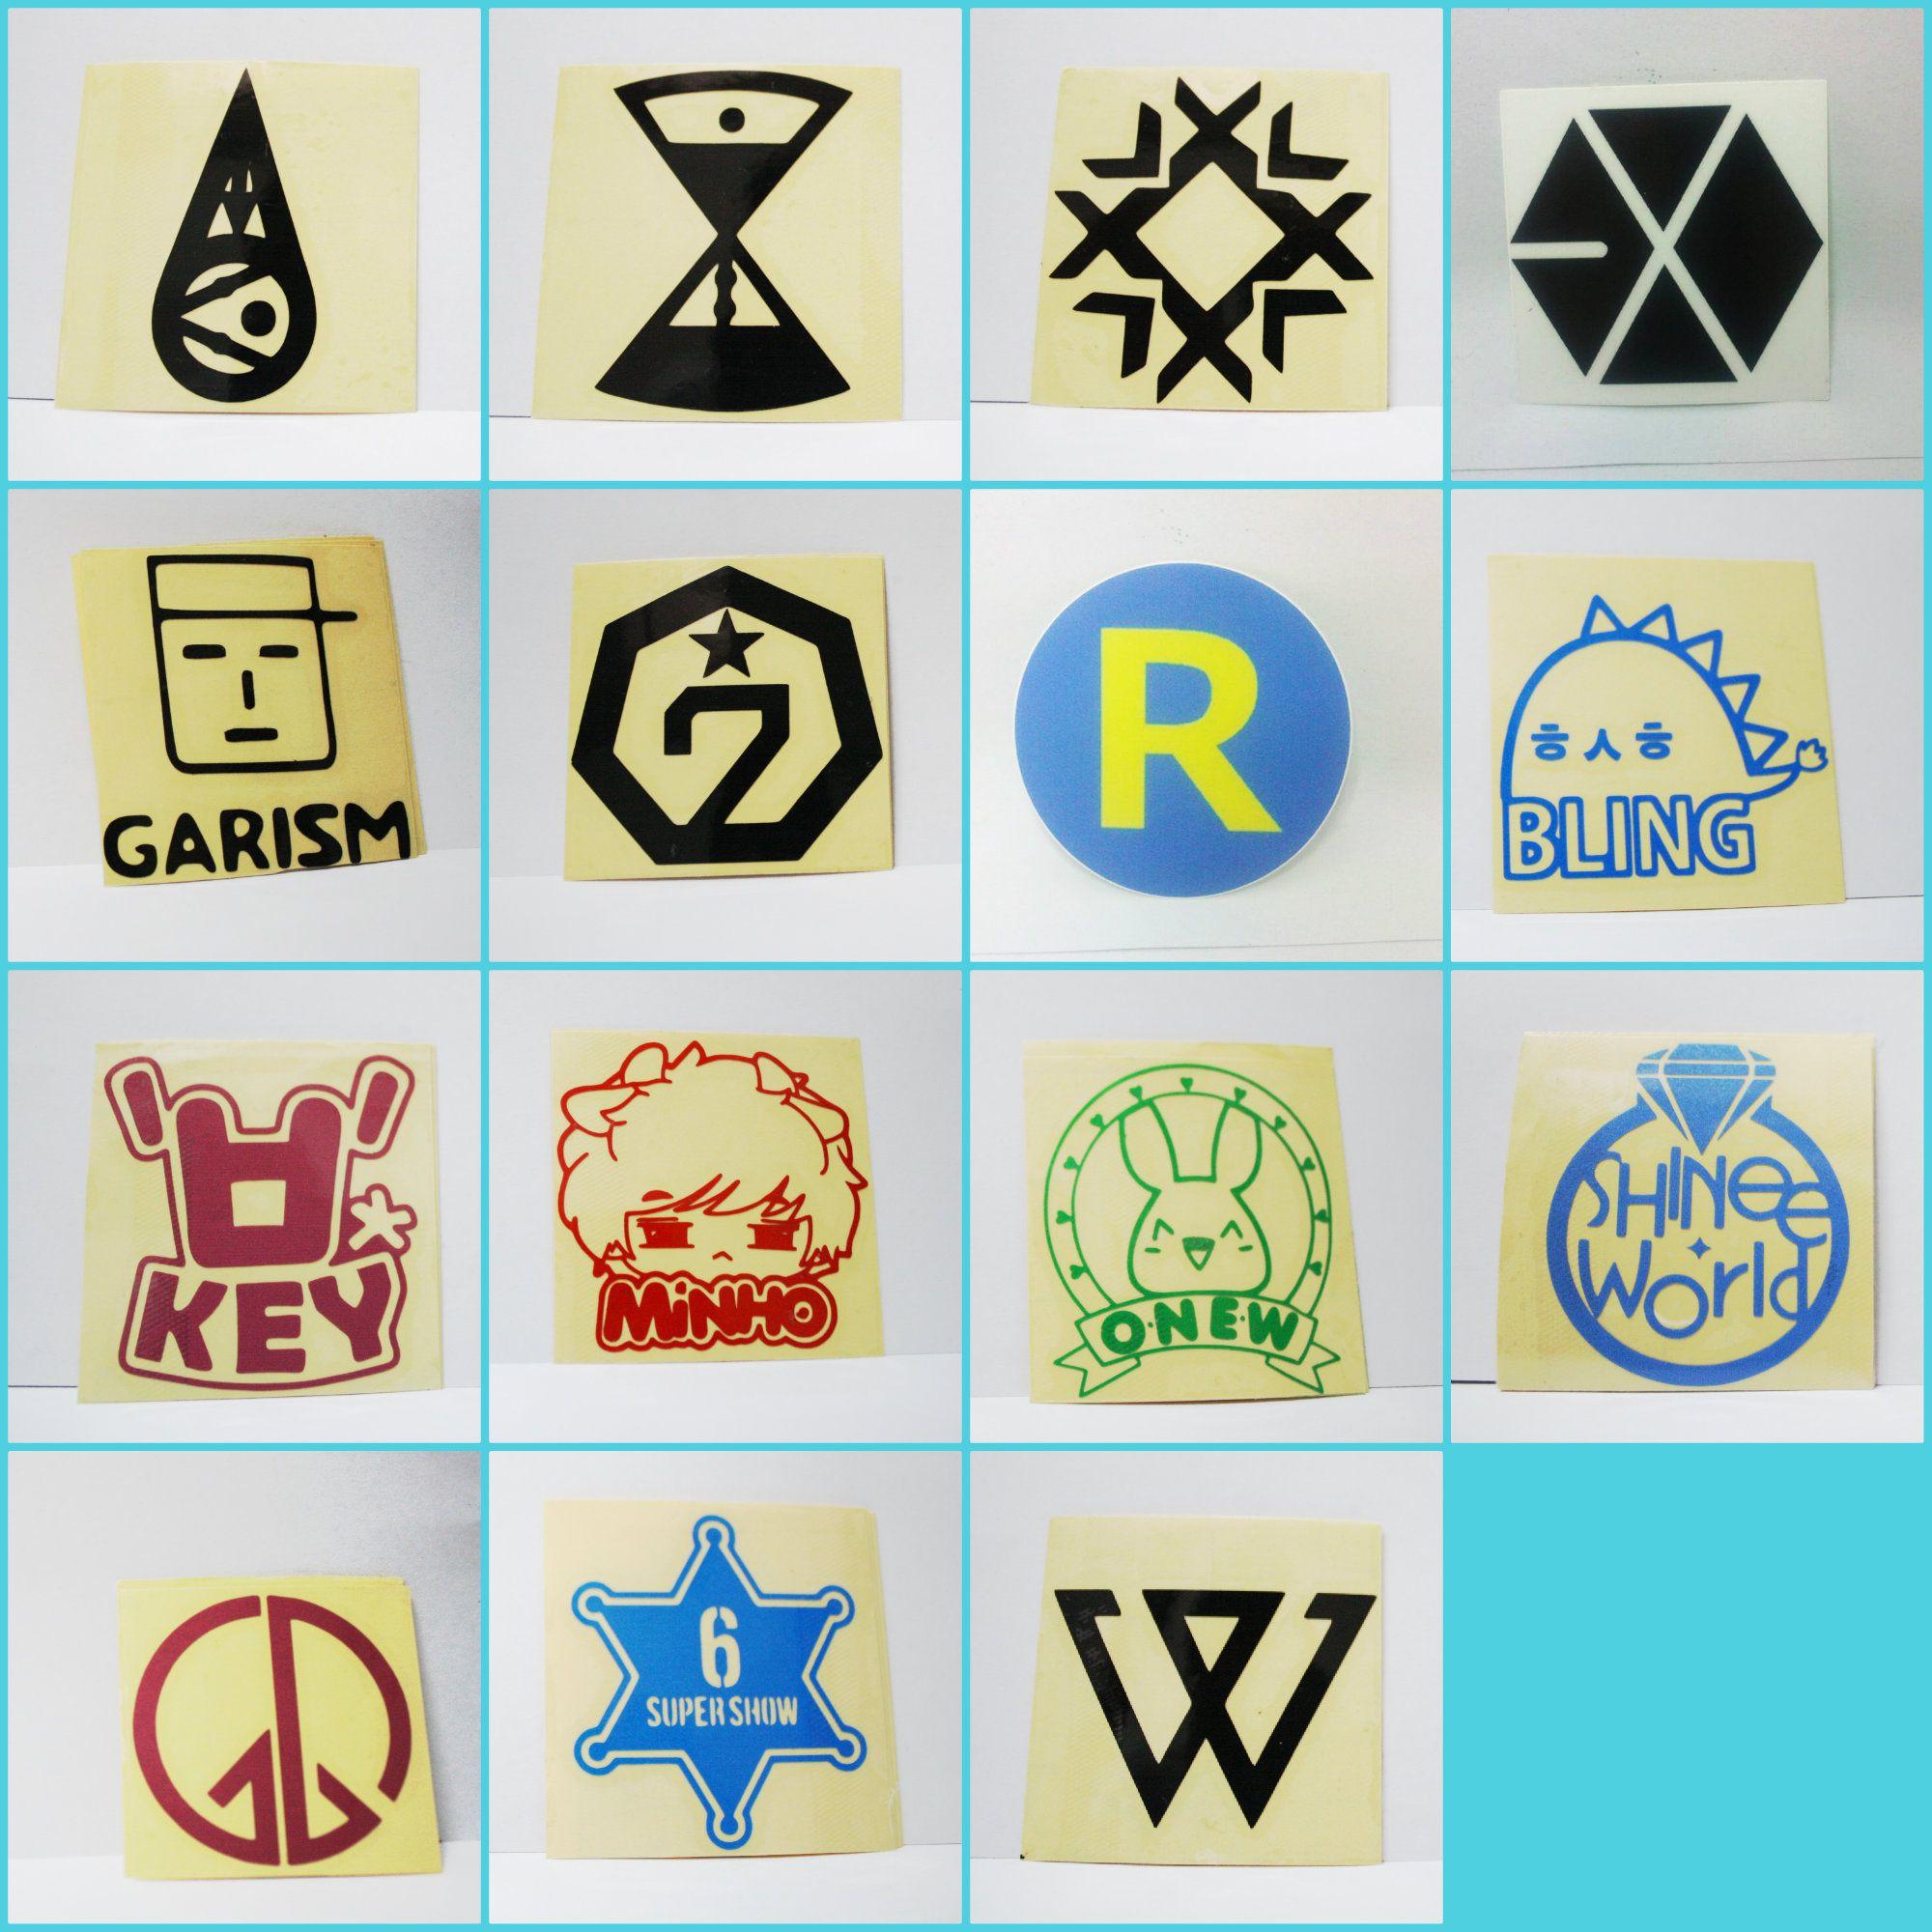 Stiker kpop harga rp 5 000 ukuran 6 x 6 cm jenis cutting